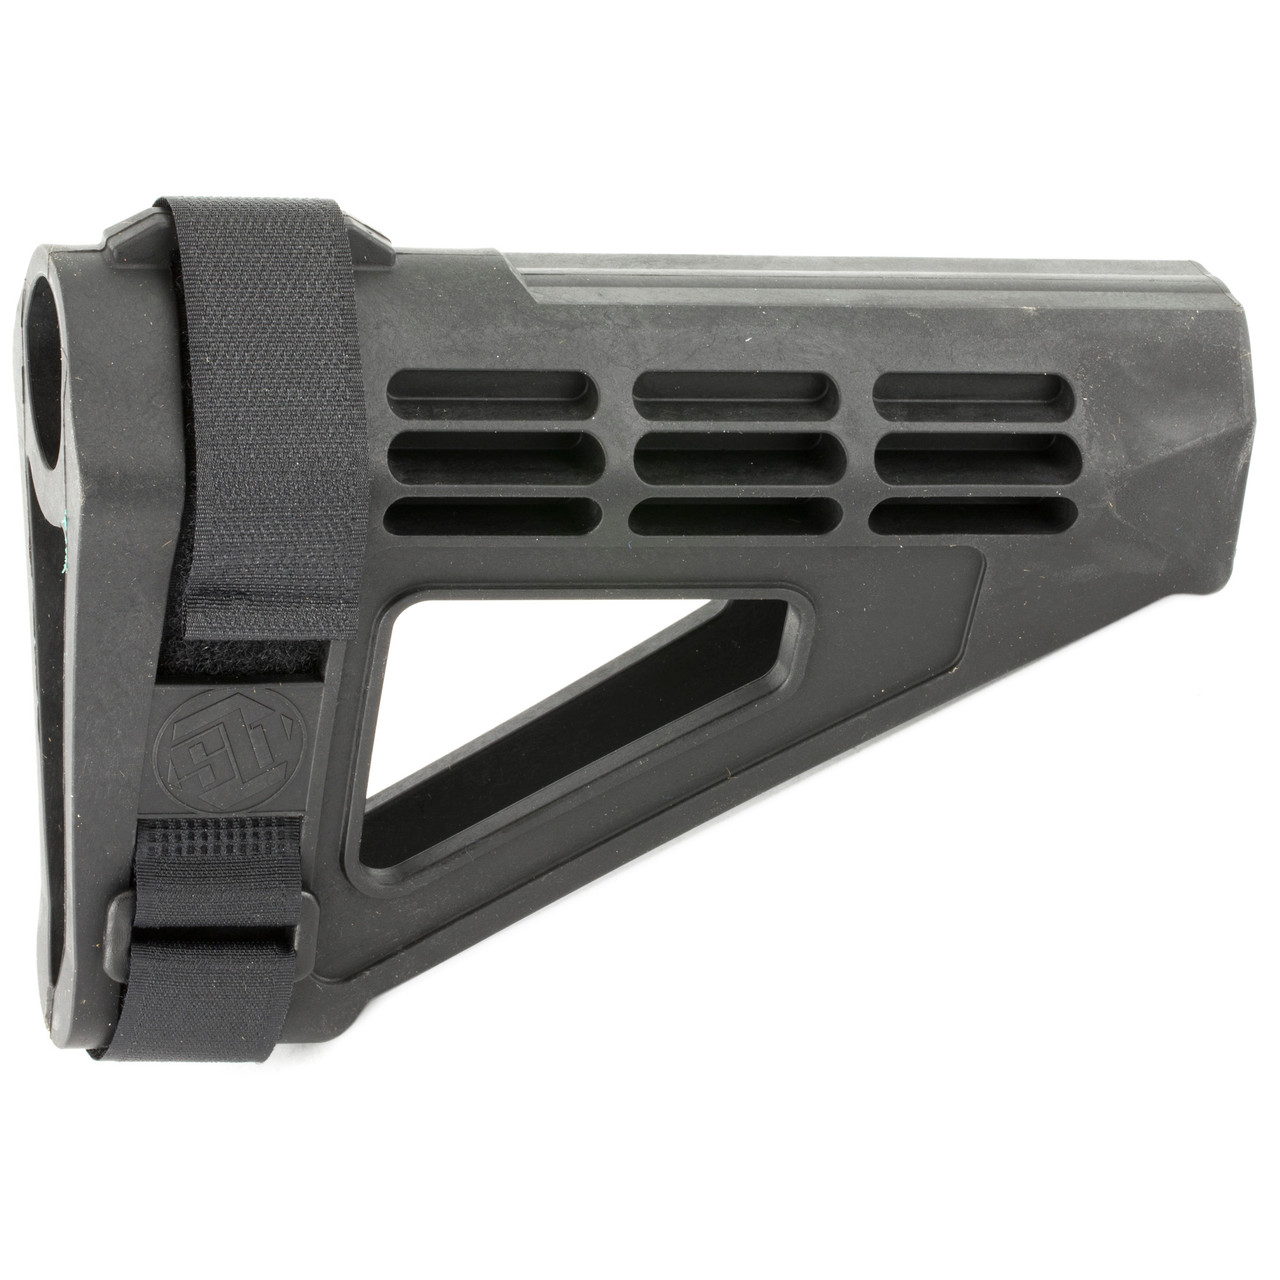 SB Tactical, SBM4, Pistol Stabilizing Brace, Fits AR Pistol Buffer Tube, Black Finish